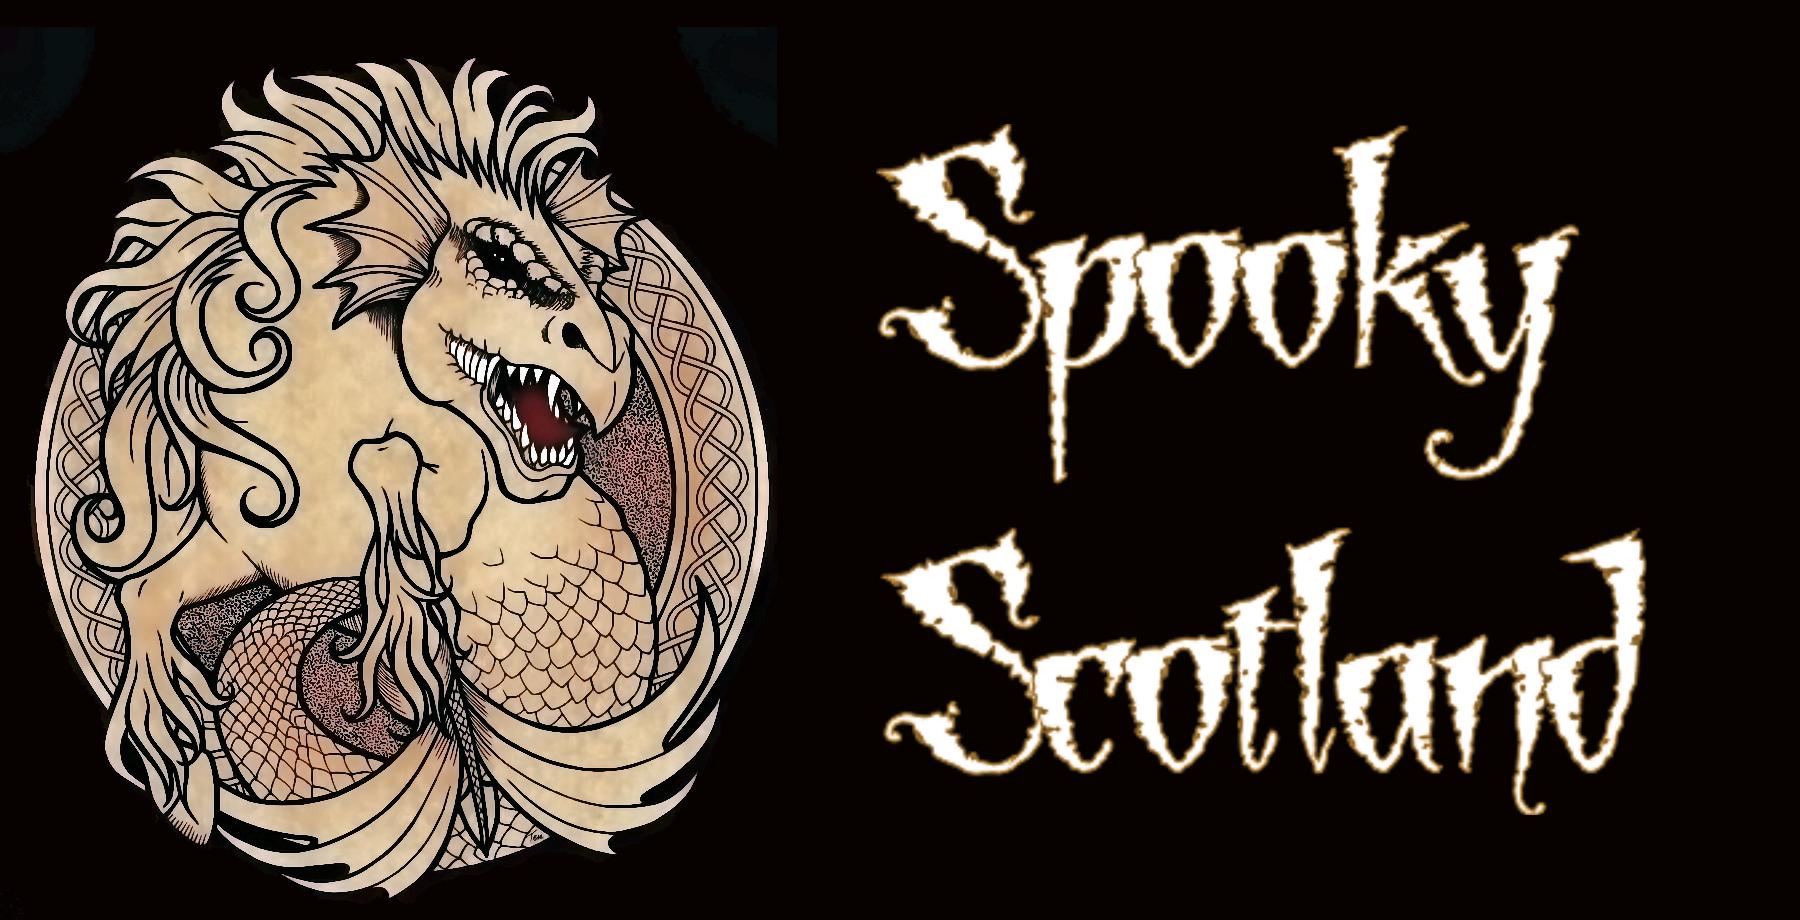 Spooky Scotland